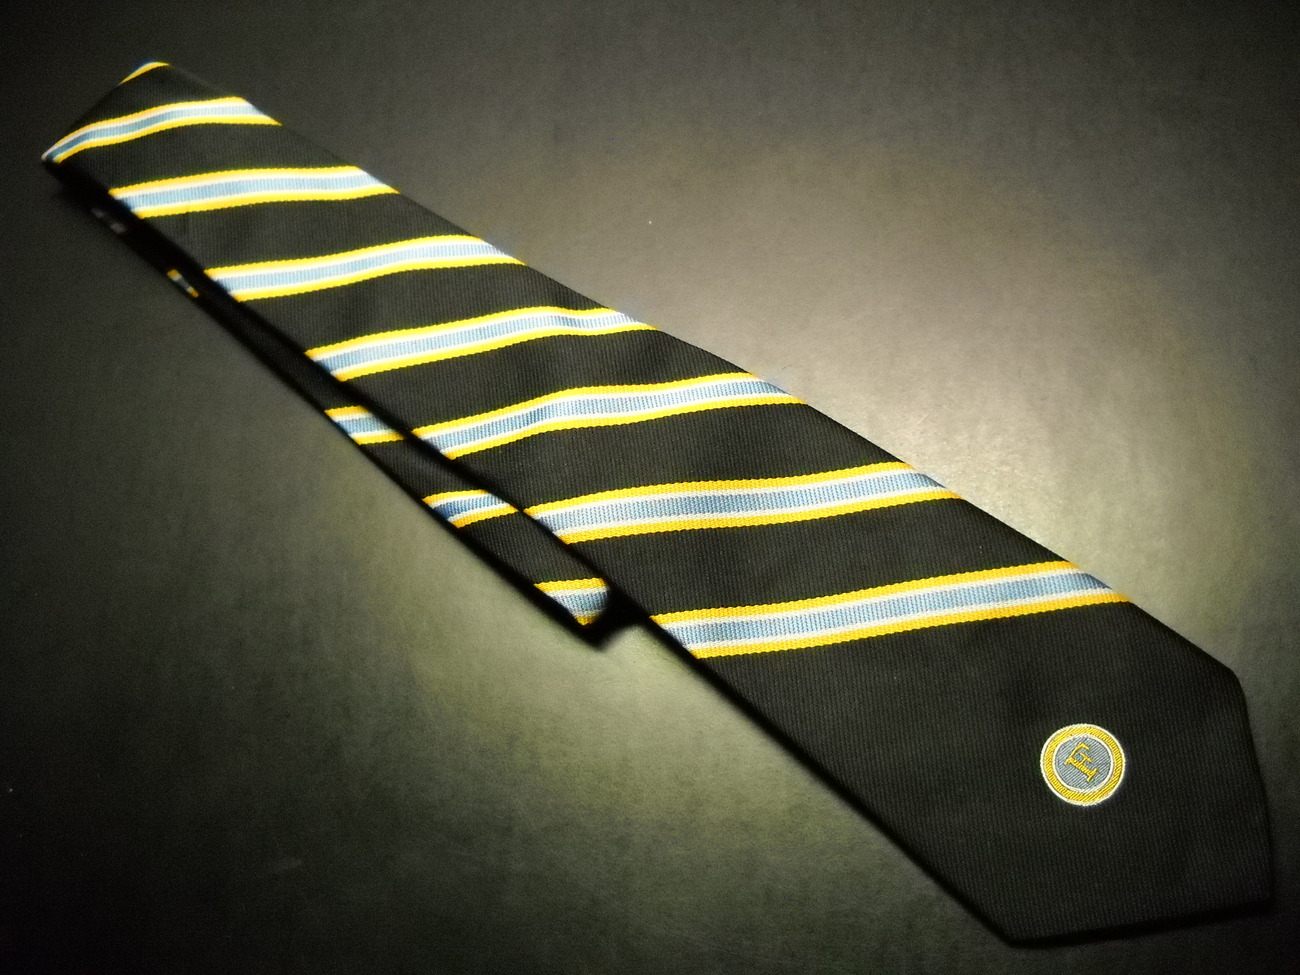 Loyal Order Of Moose Neck Tie Letter F Hartmarx Co. Fashionarie Apparel